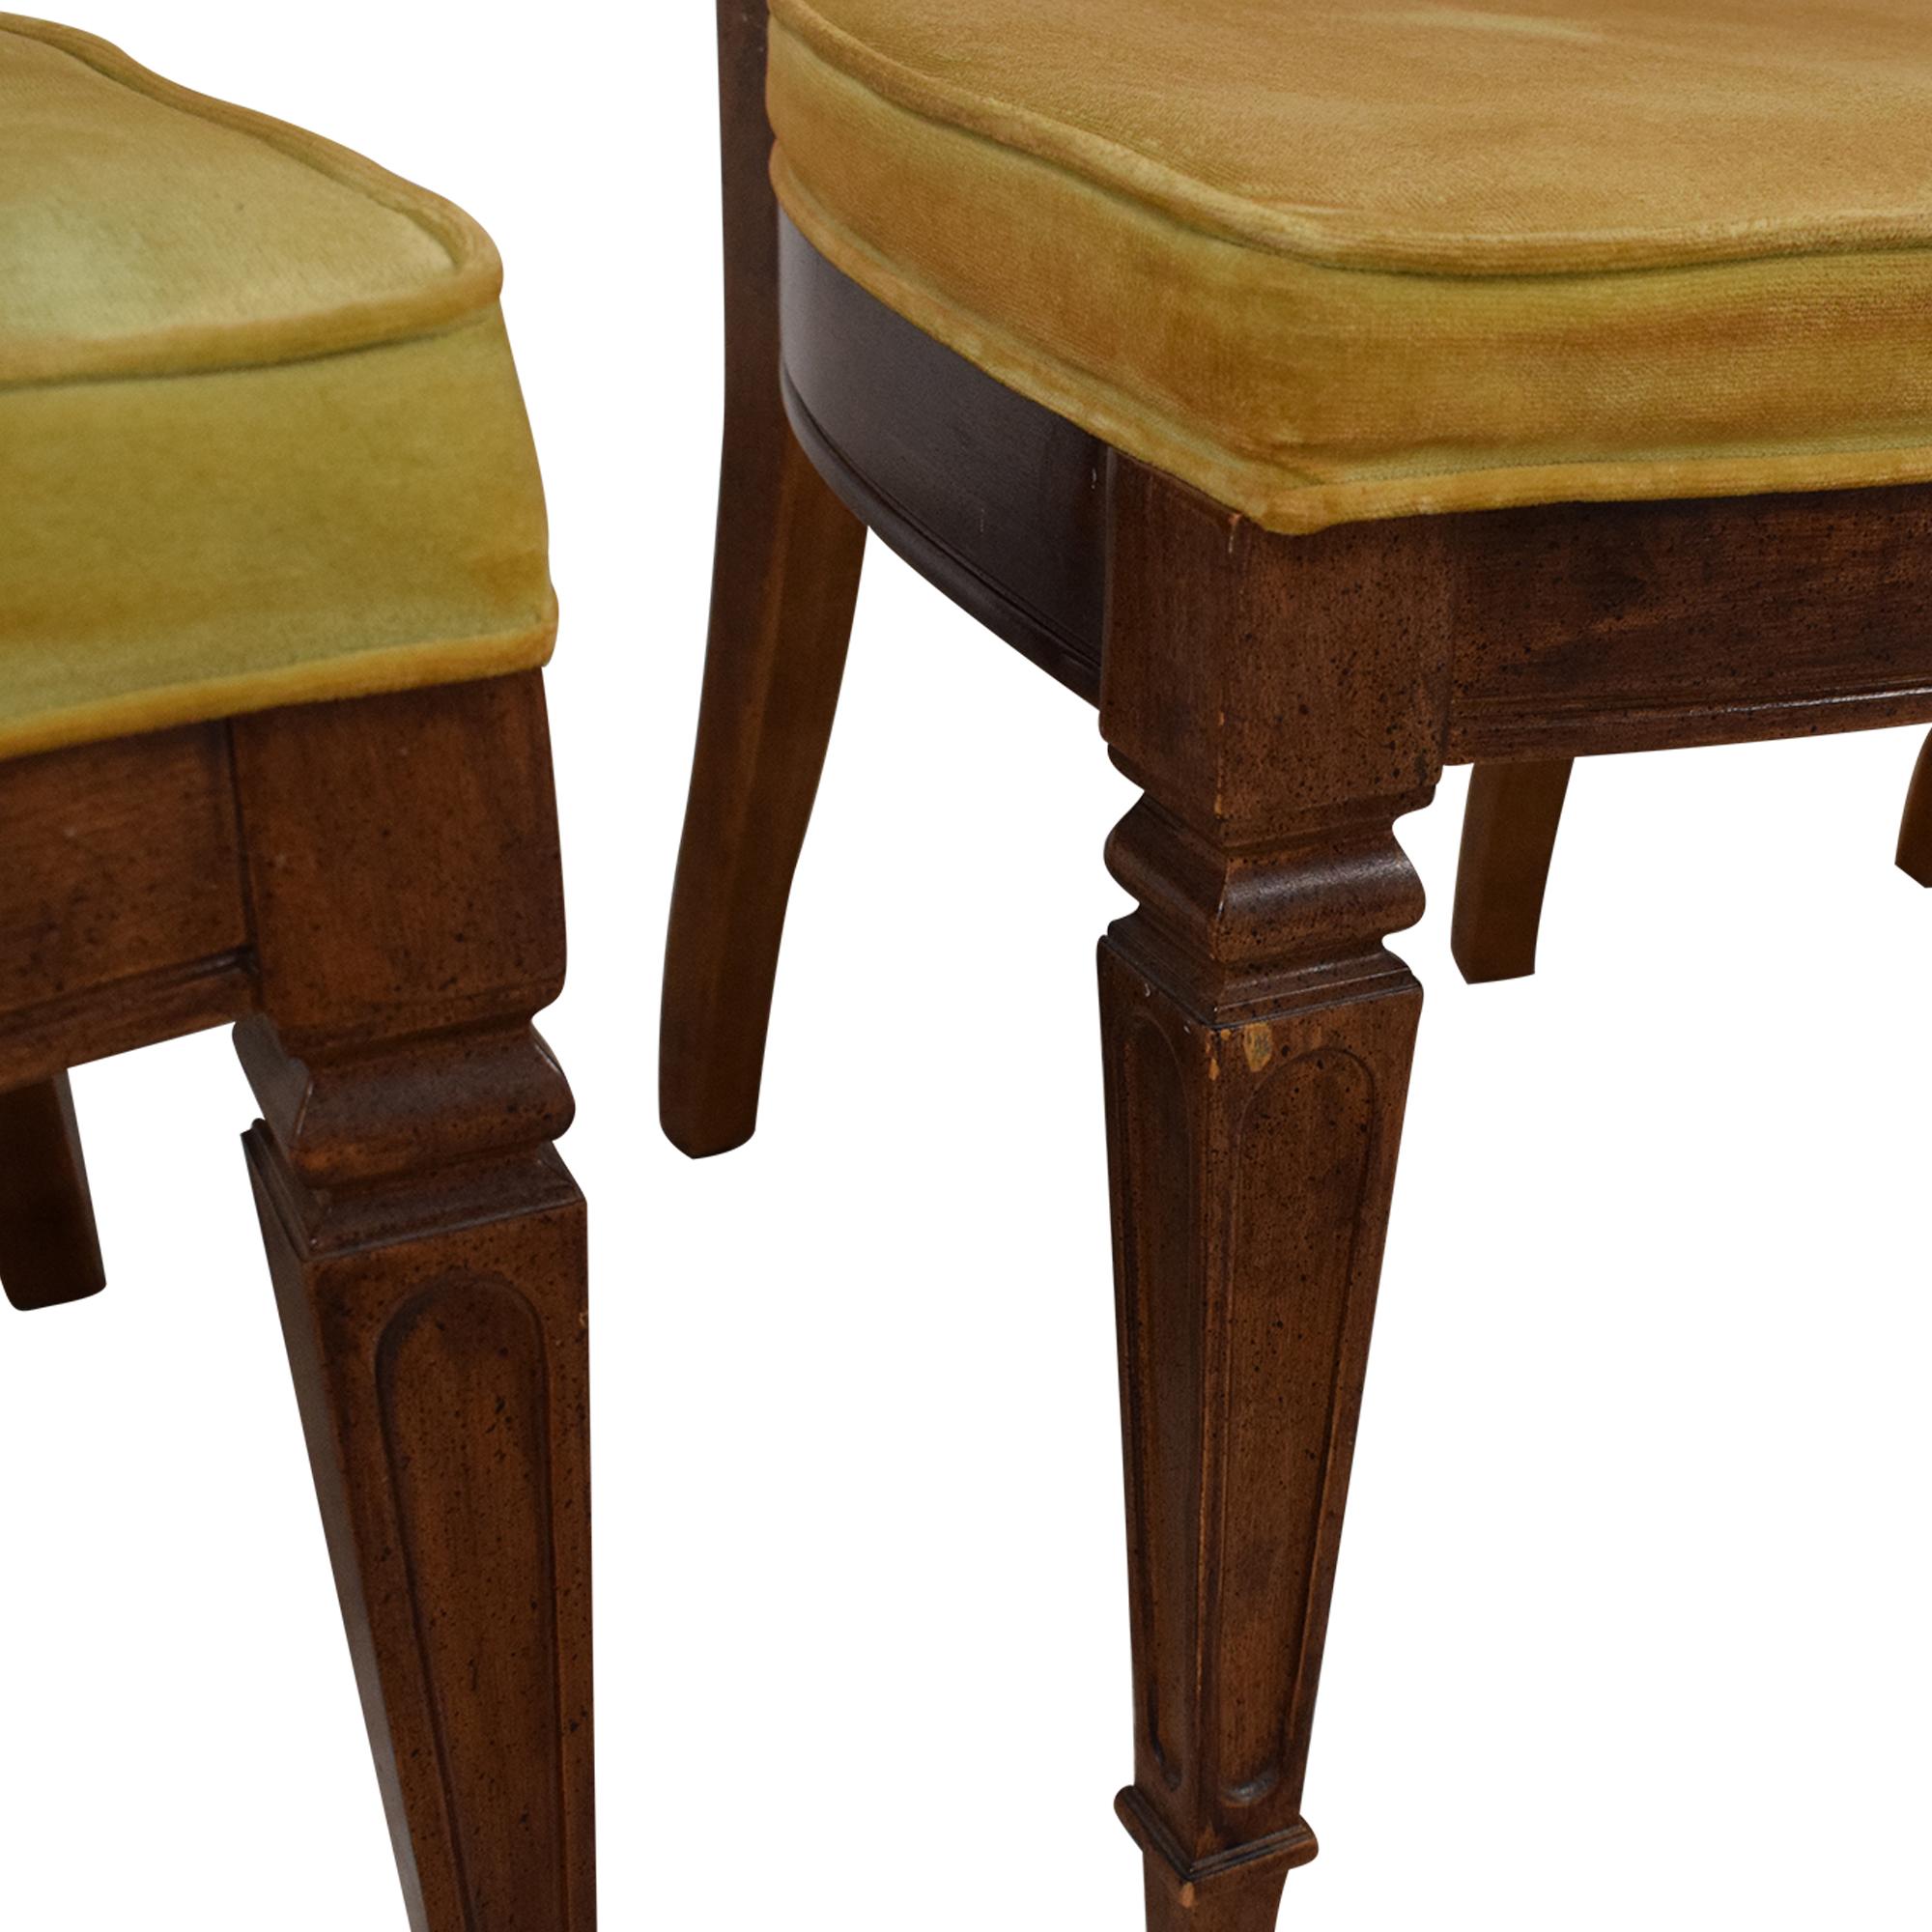 Thomasville Thomasville Italian Provincial Style Dining Chairs nj